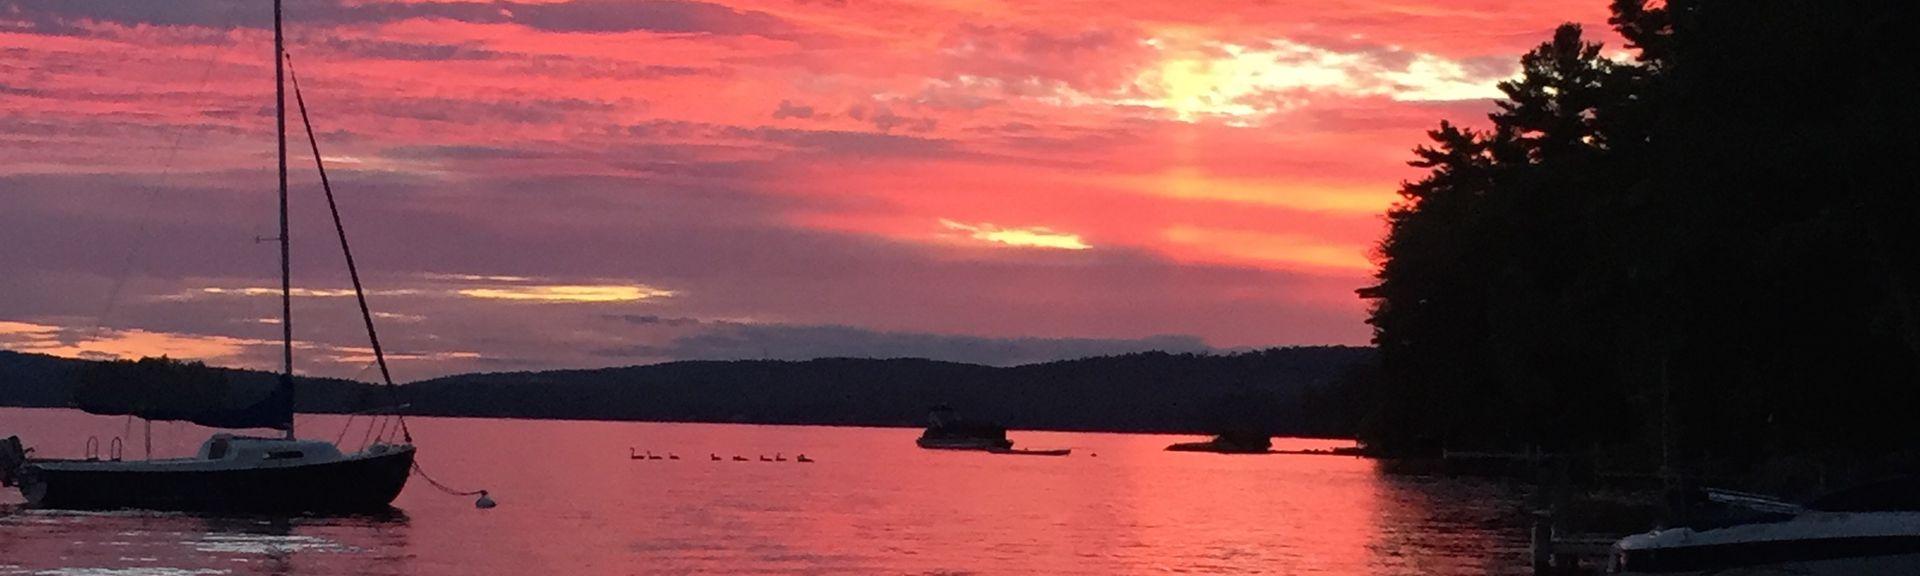 Acton, Maine, Estados Unidos